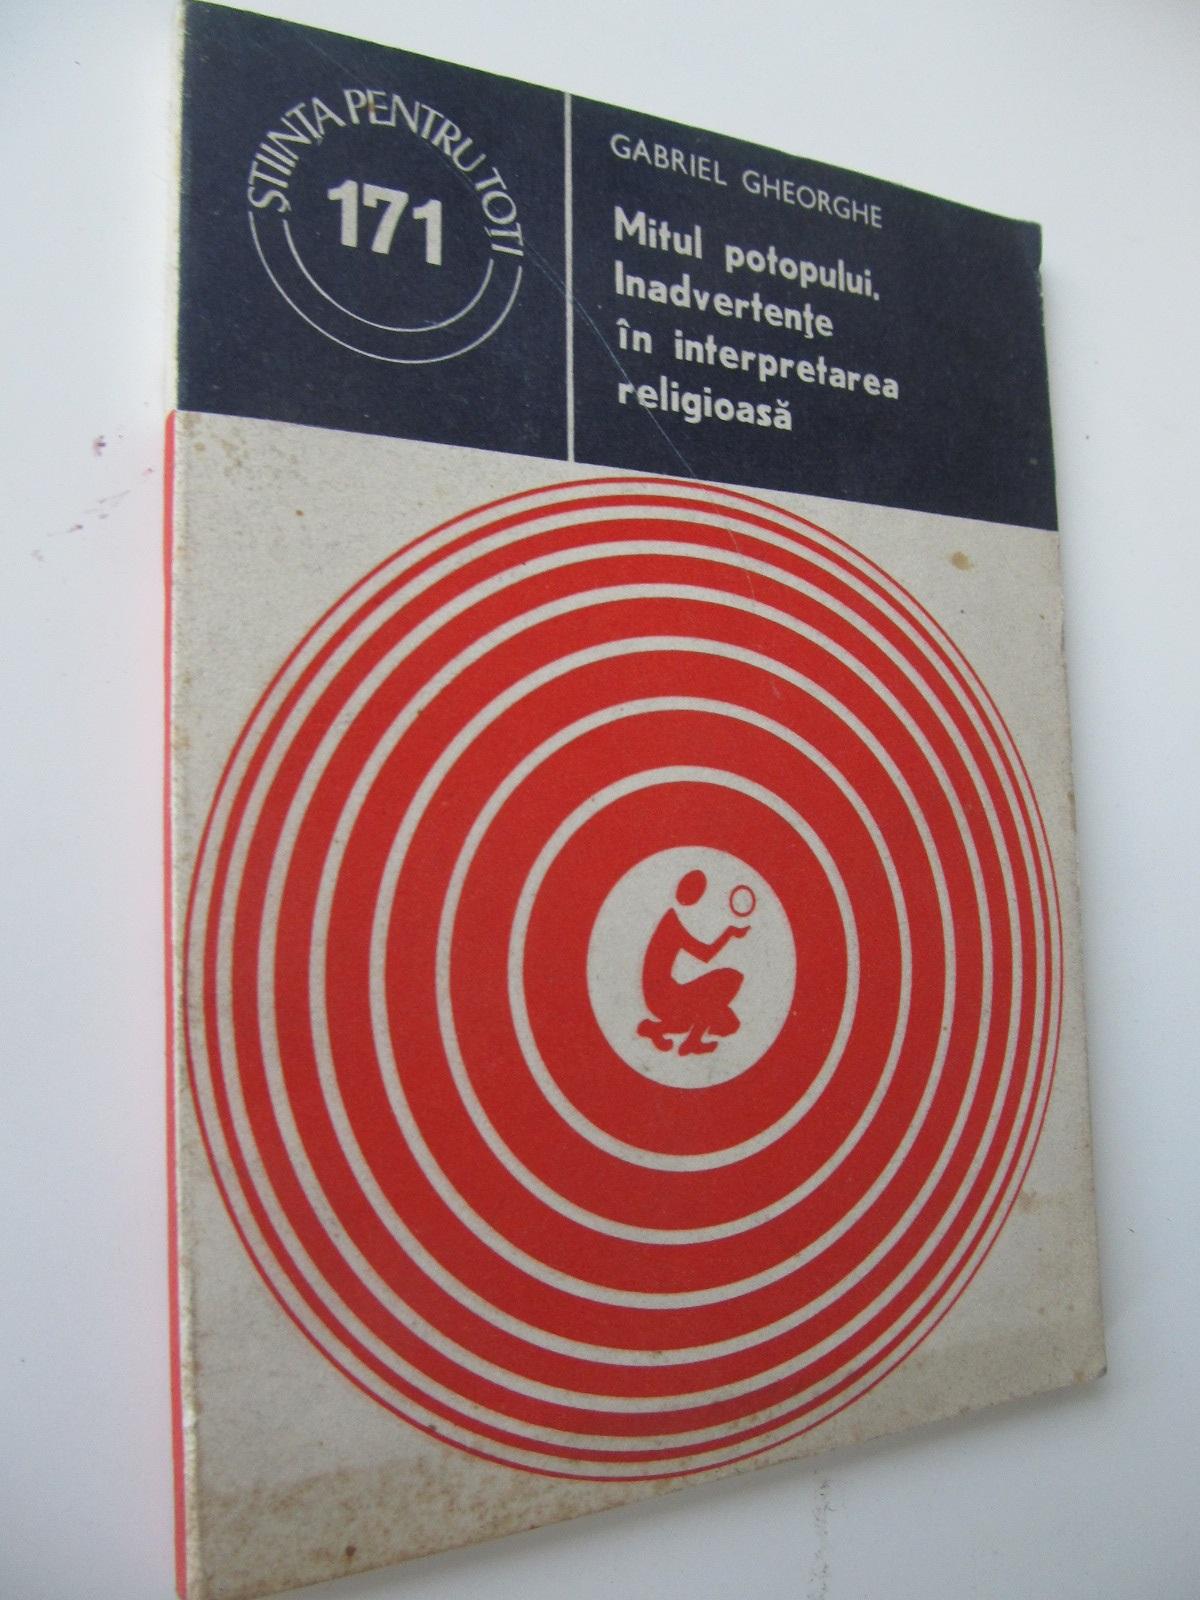 Mitul potopului - Inadvertente in interpretarea religioasa - Gabriel Gheorghe | Detalii carte